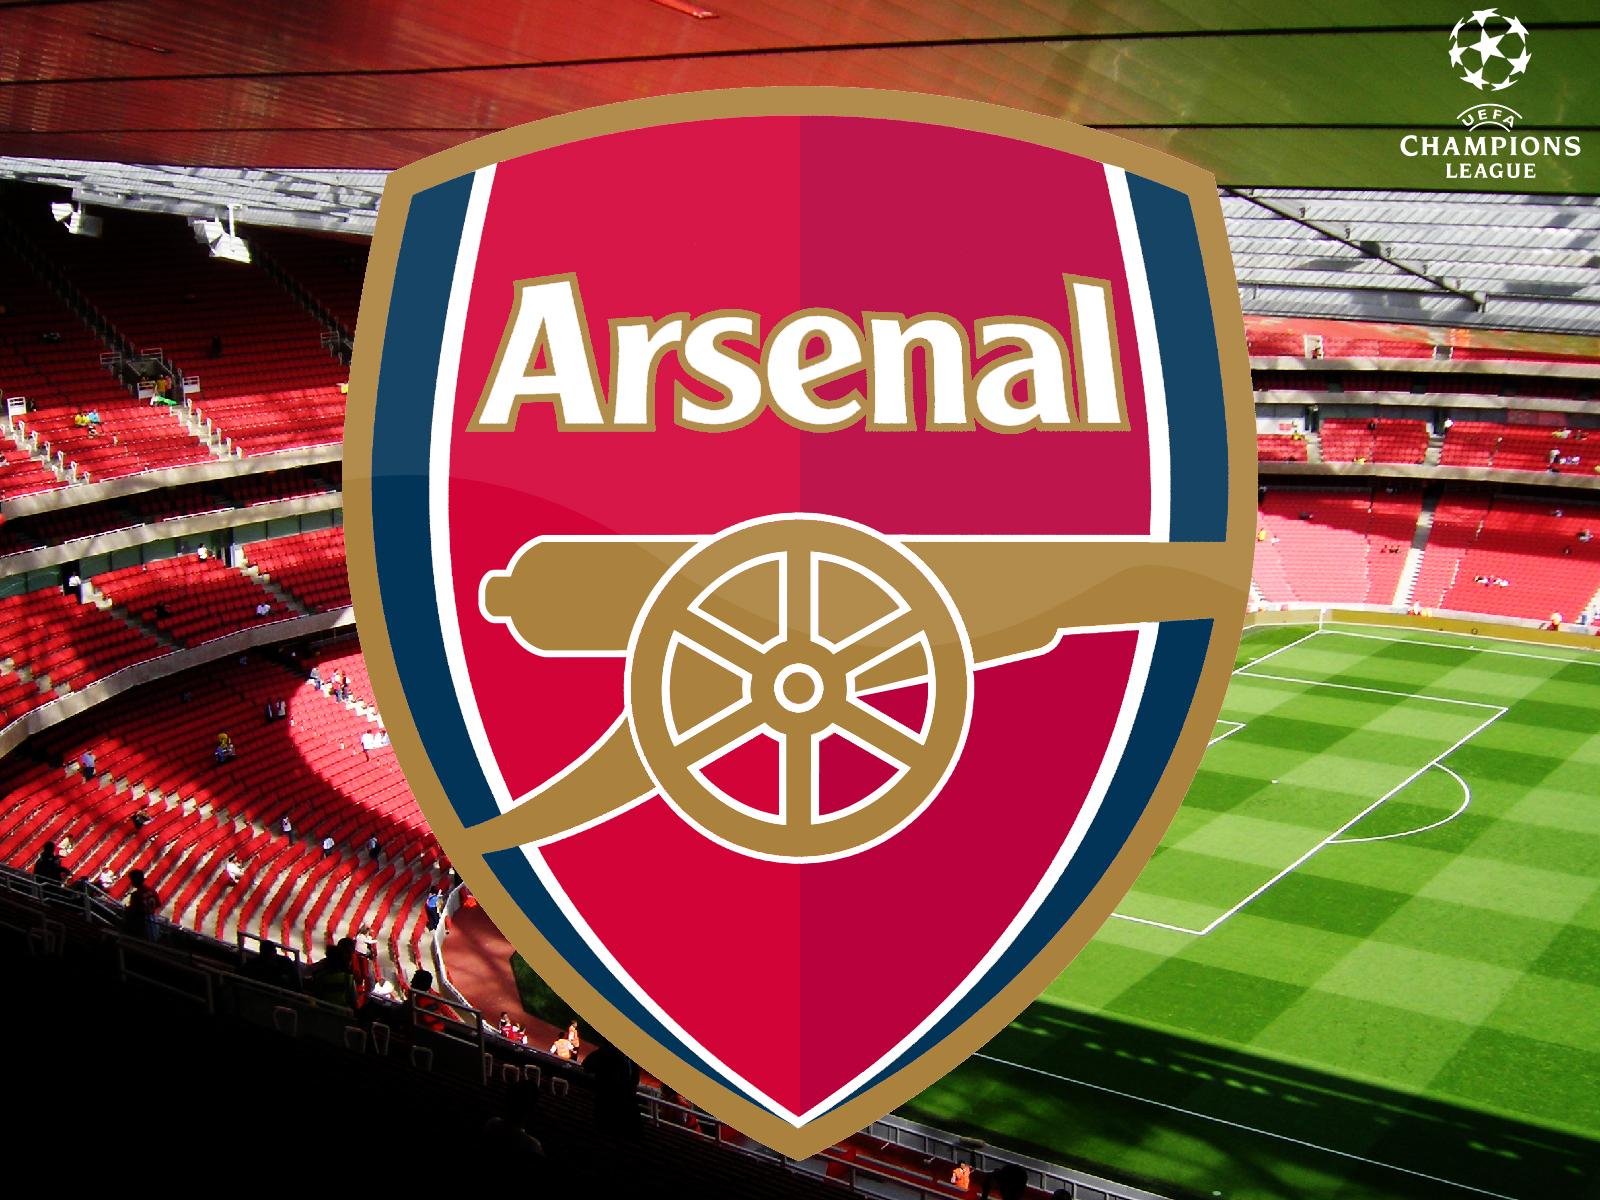 http://1.bp.blogspot.com/-1cypNT88Ot8/T0E1jpXAvnI/AAAAAAABKVo/urz7xVCmcOA/s1600/Arsenal_Logo9.jpg